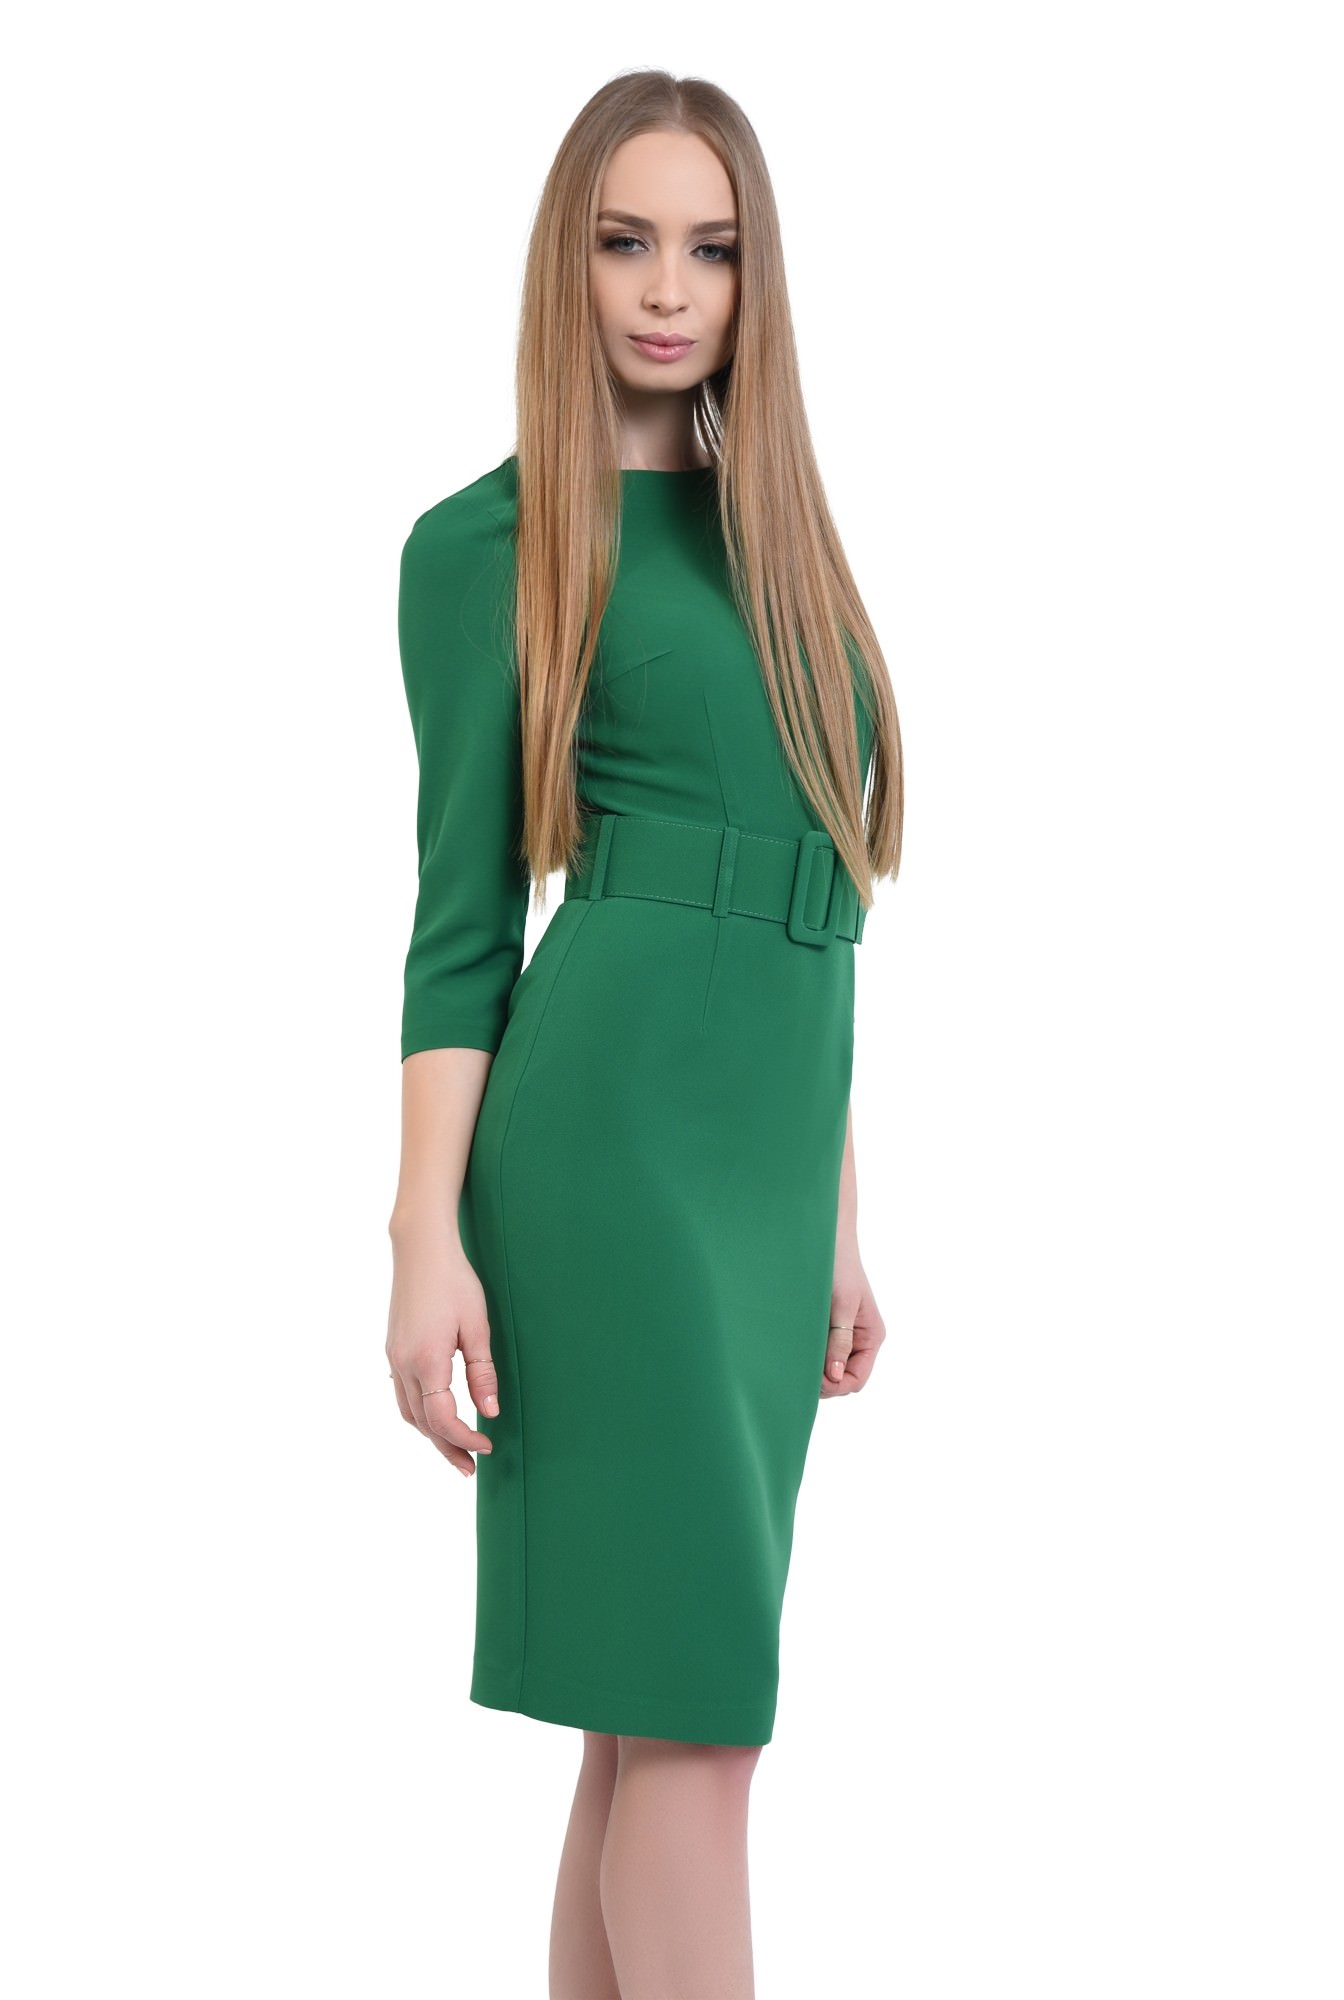 0 - Rochie casual, verde